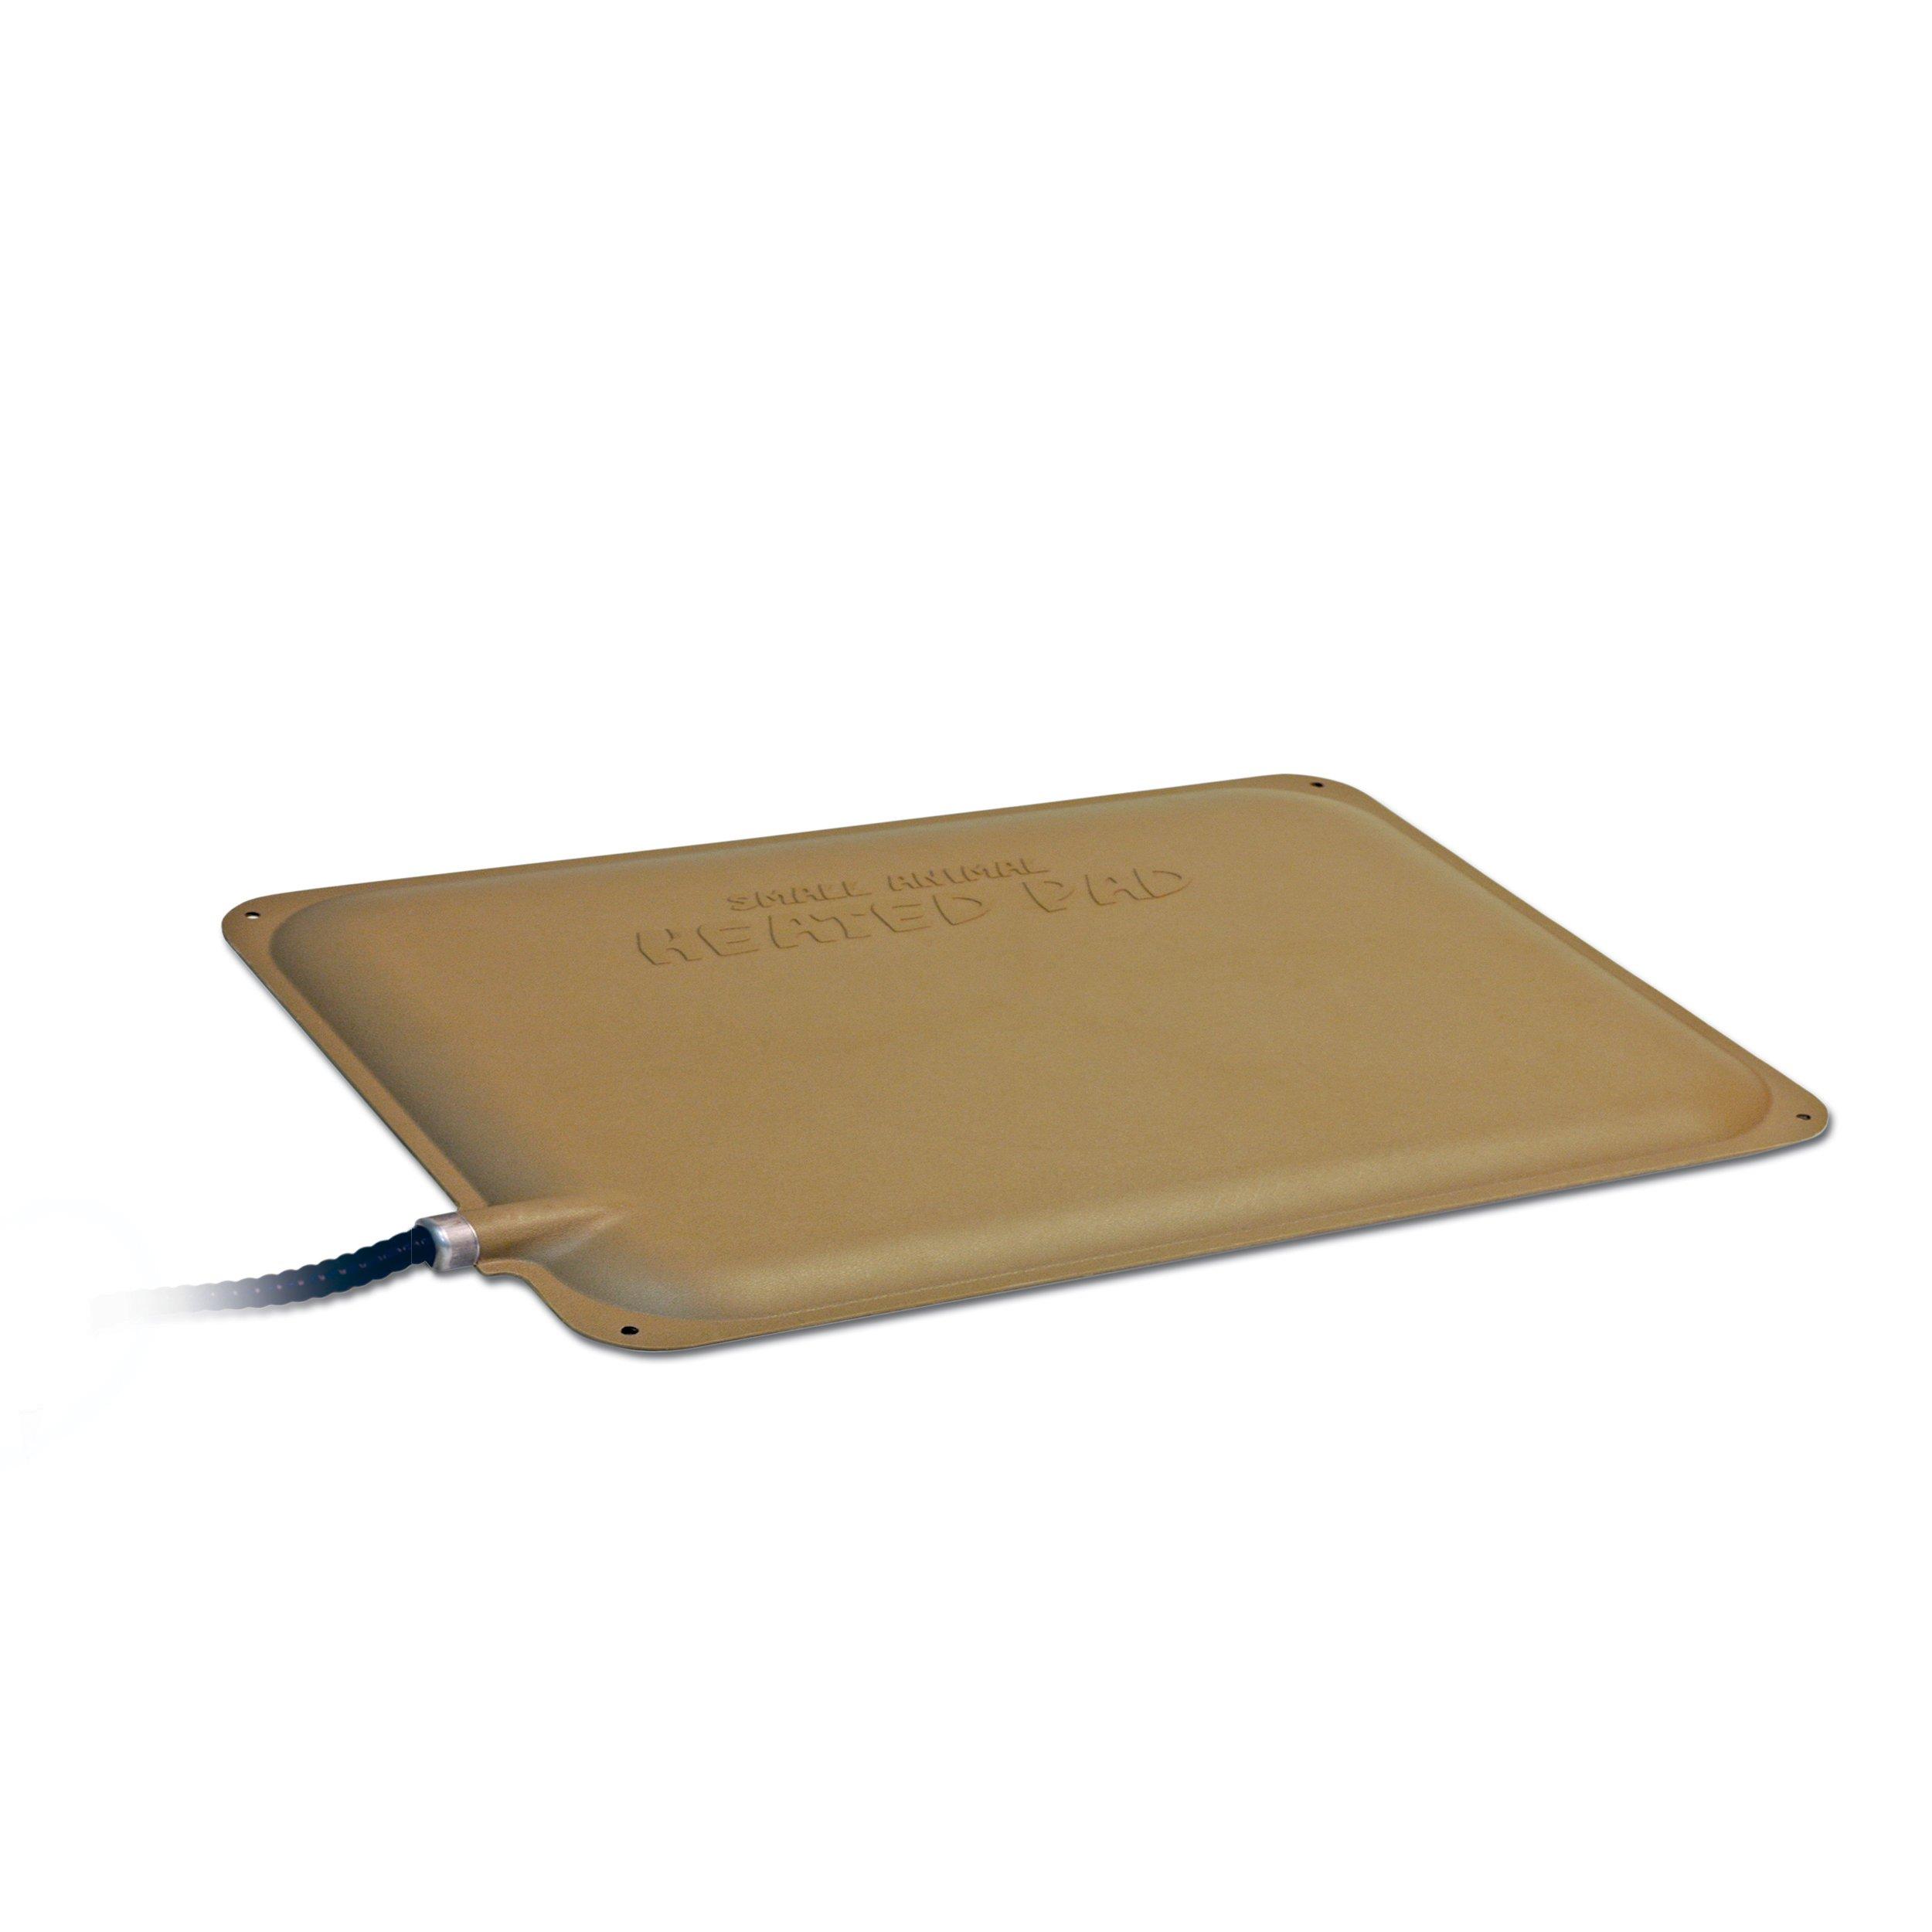 K&H Pet Products Thermo-Peep Heated Pad Tan 9'' x 12'' 25W